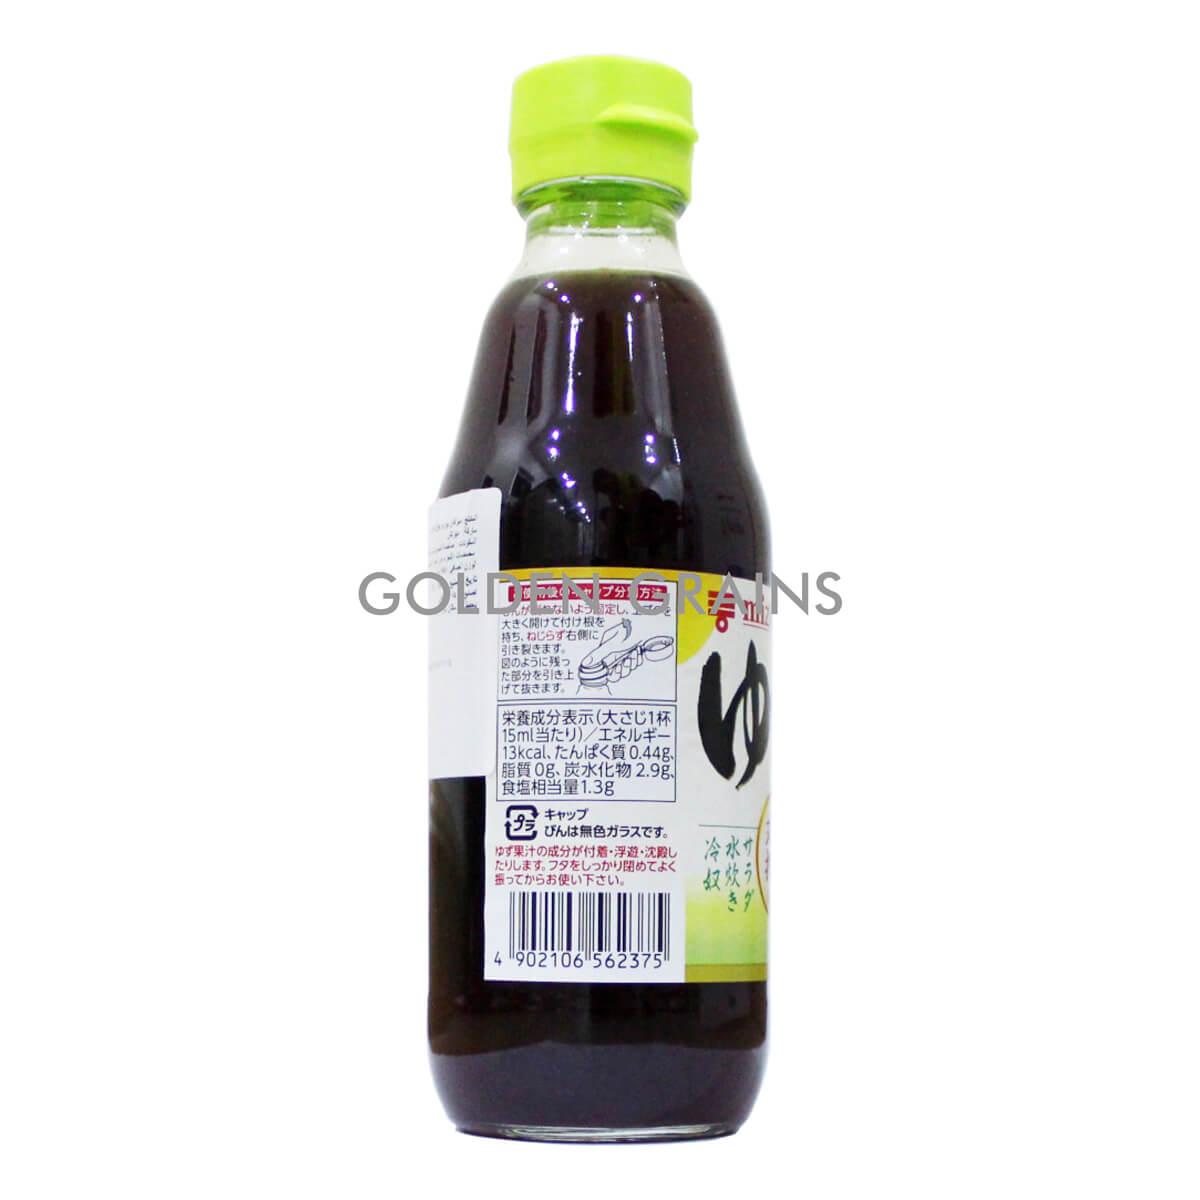 Golden Grains Mizkan - Yuzupon - Back.jpg